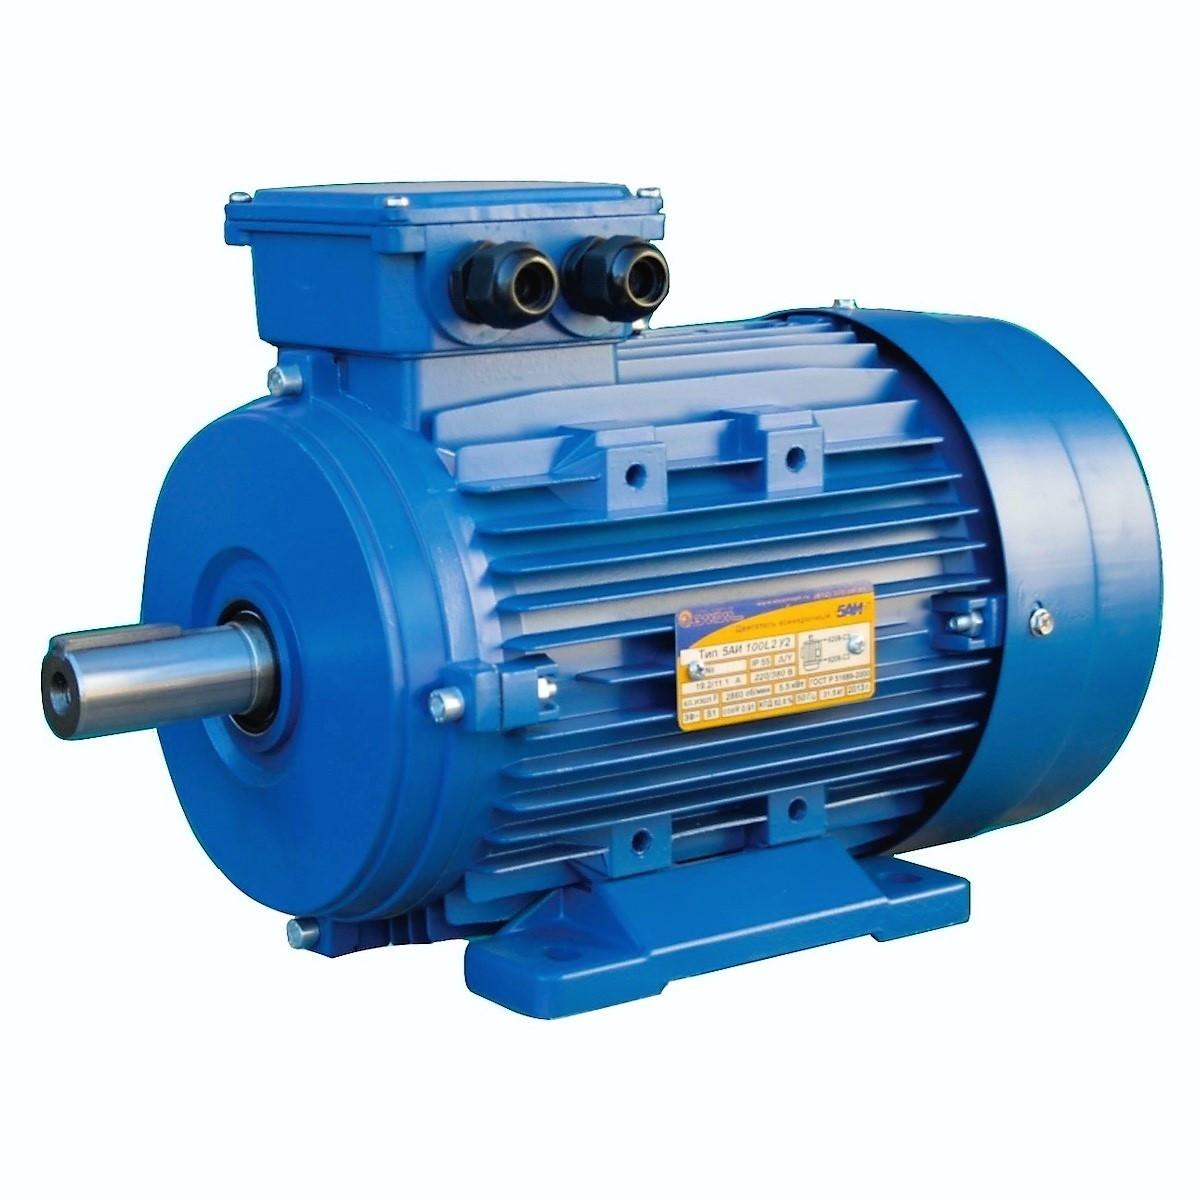 Электродвигатель 5АИ 80 A4 1.1кВт, 1500 об/мин